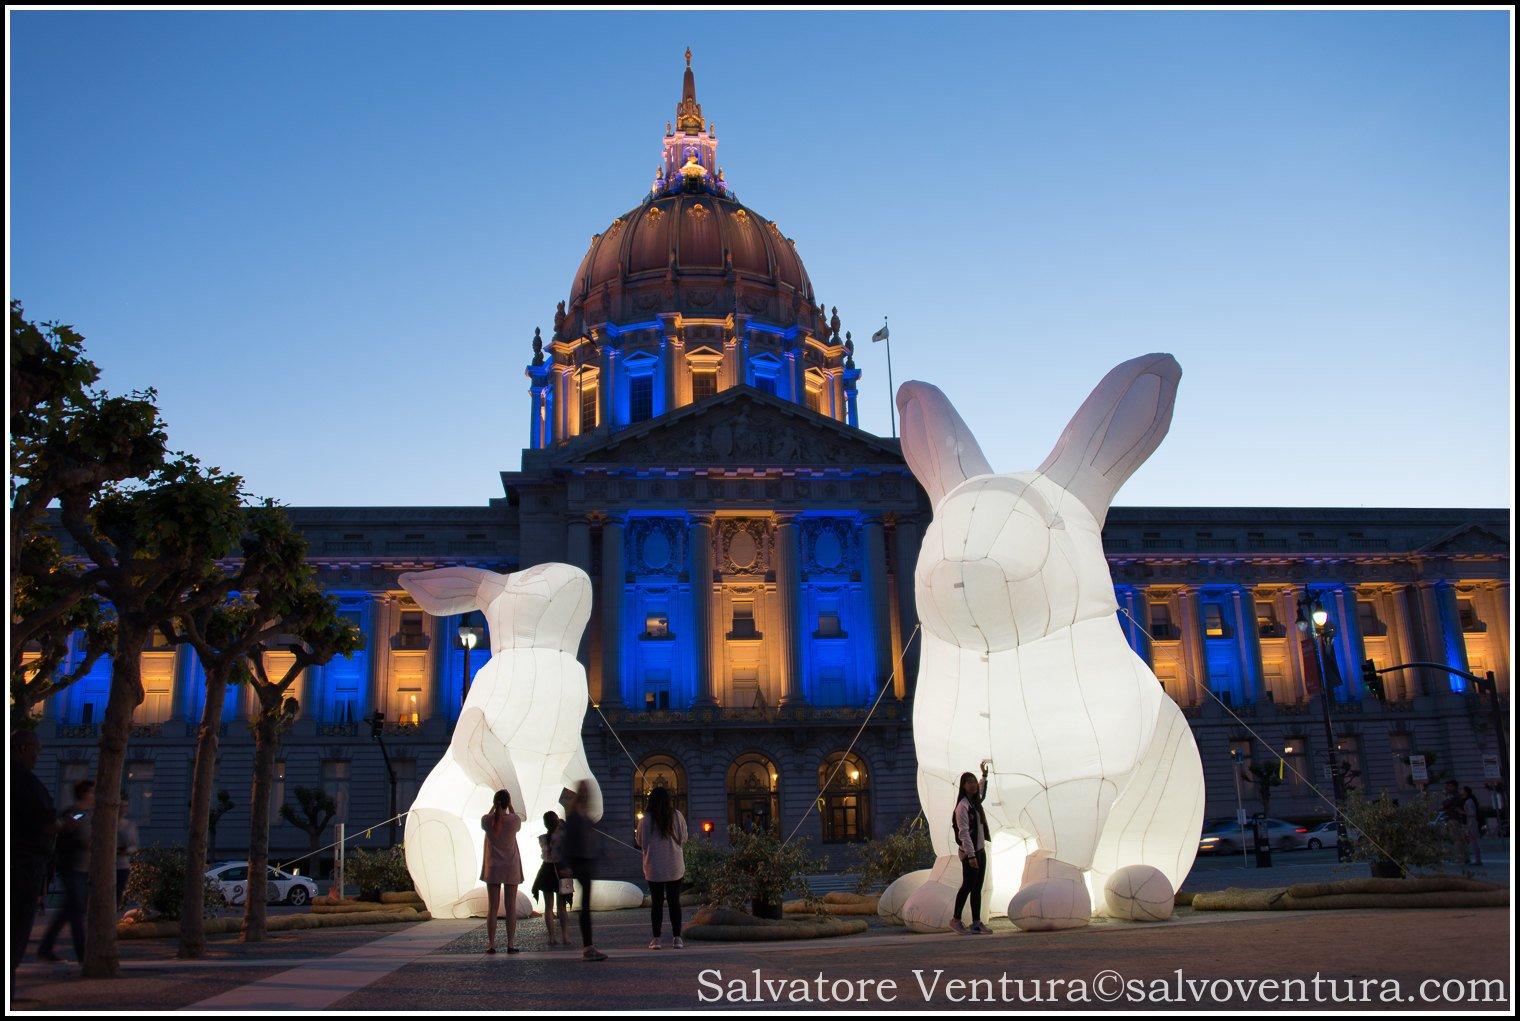 2016.04.17 SF Civic Center Intrude Art Exhibit-salvoventura-blog-DSC_8601